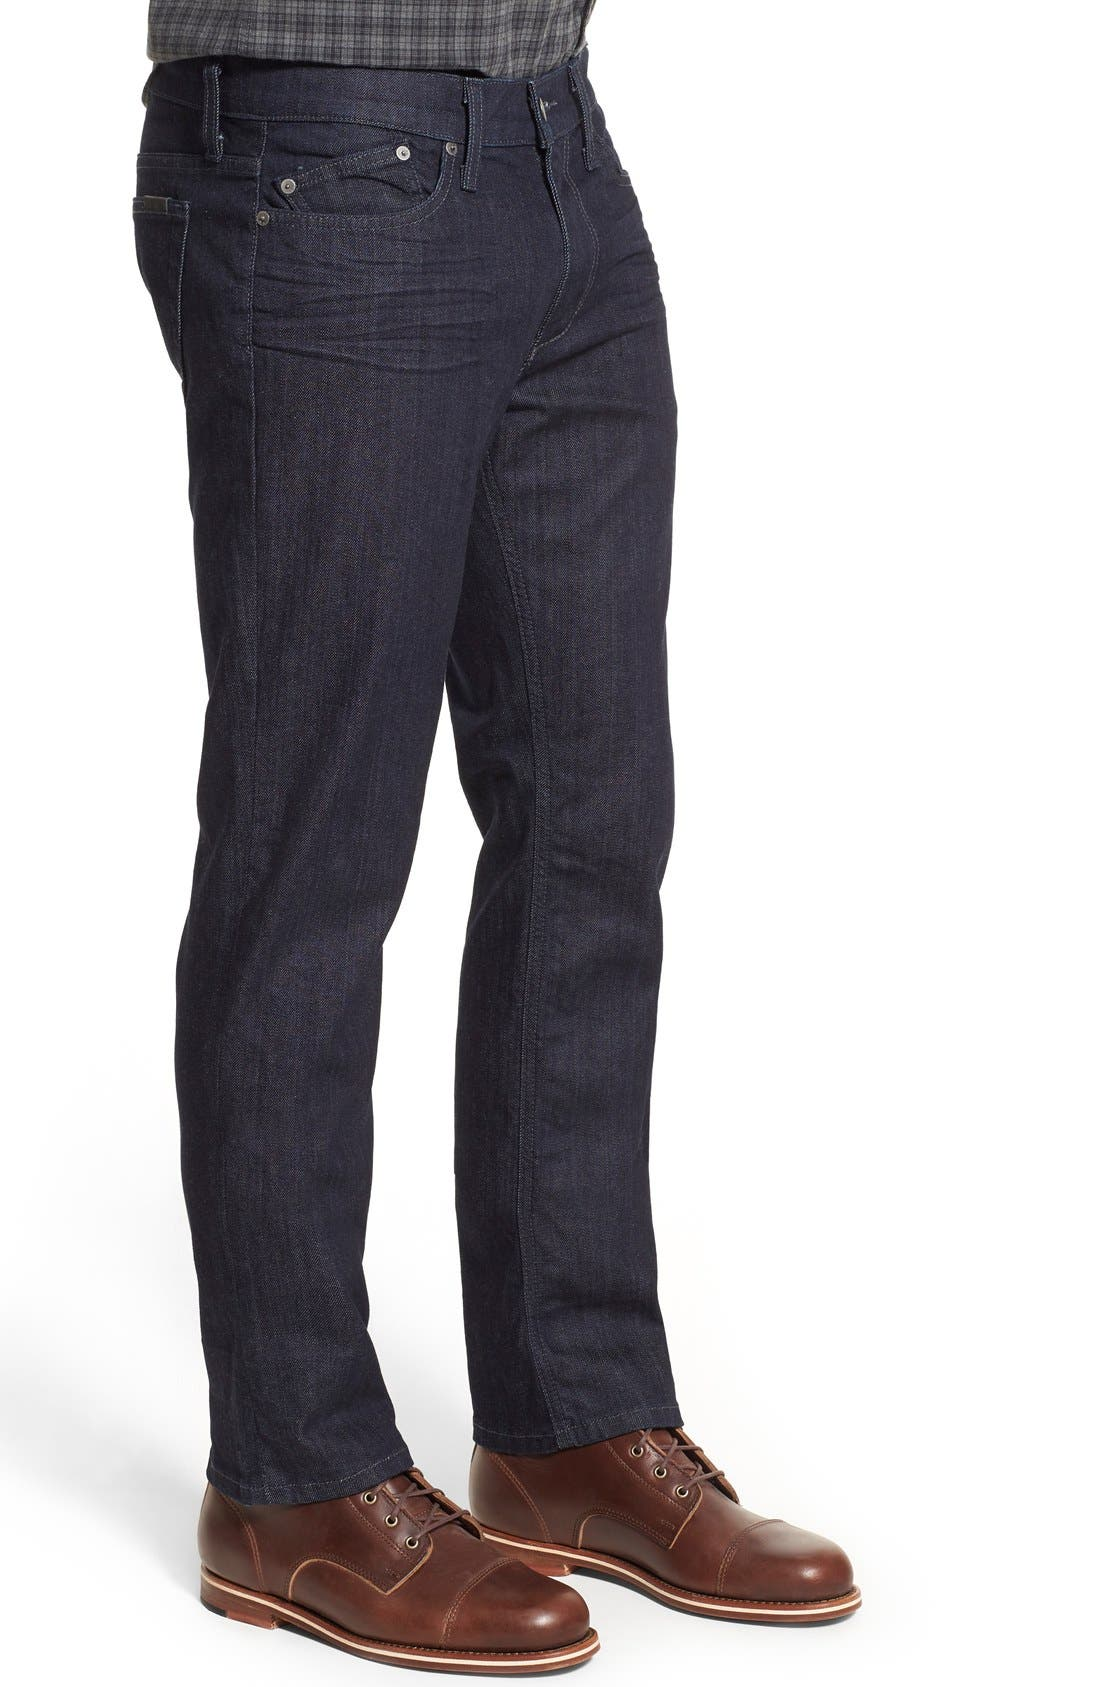 Brixton Slim Straight Fit Jeans,                             Alternate thumbnail 8, color,                             KING